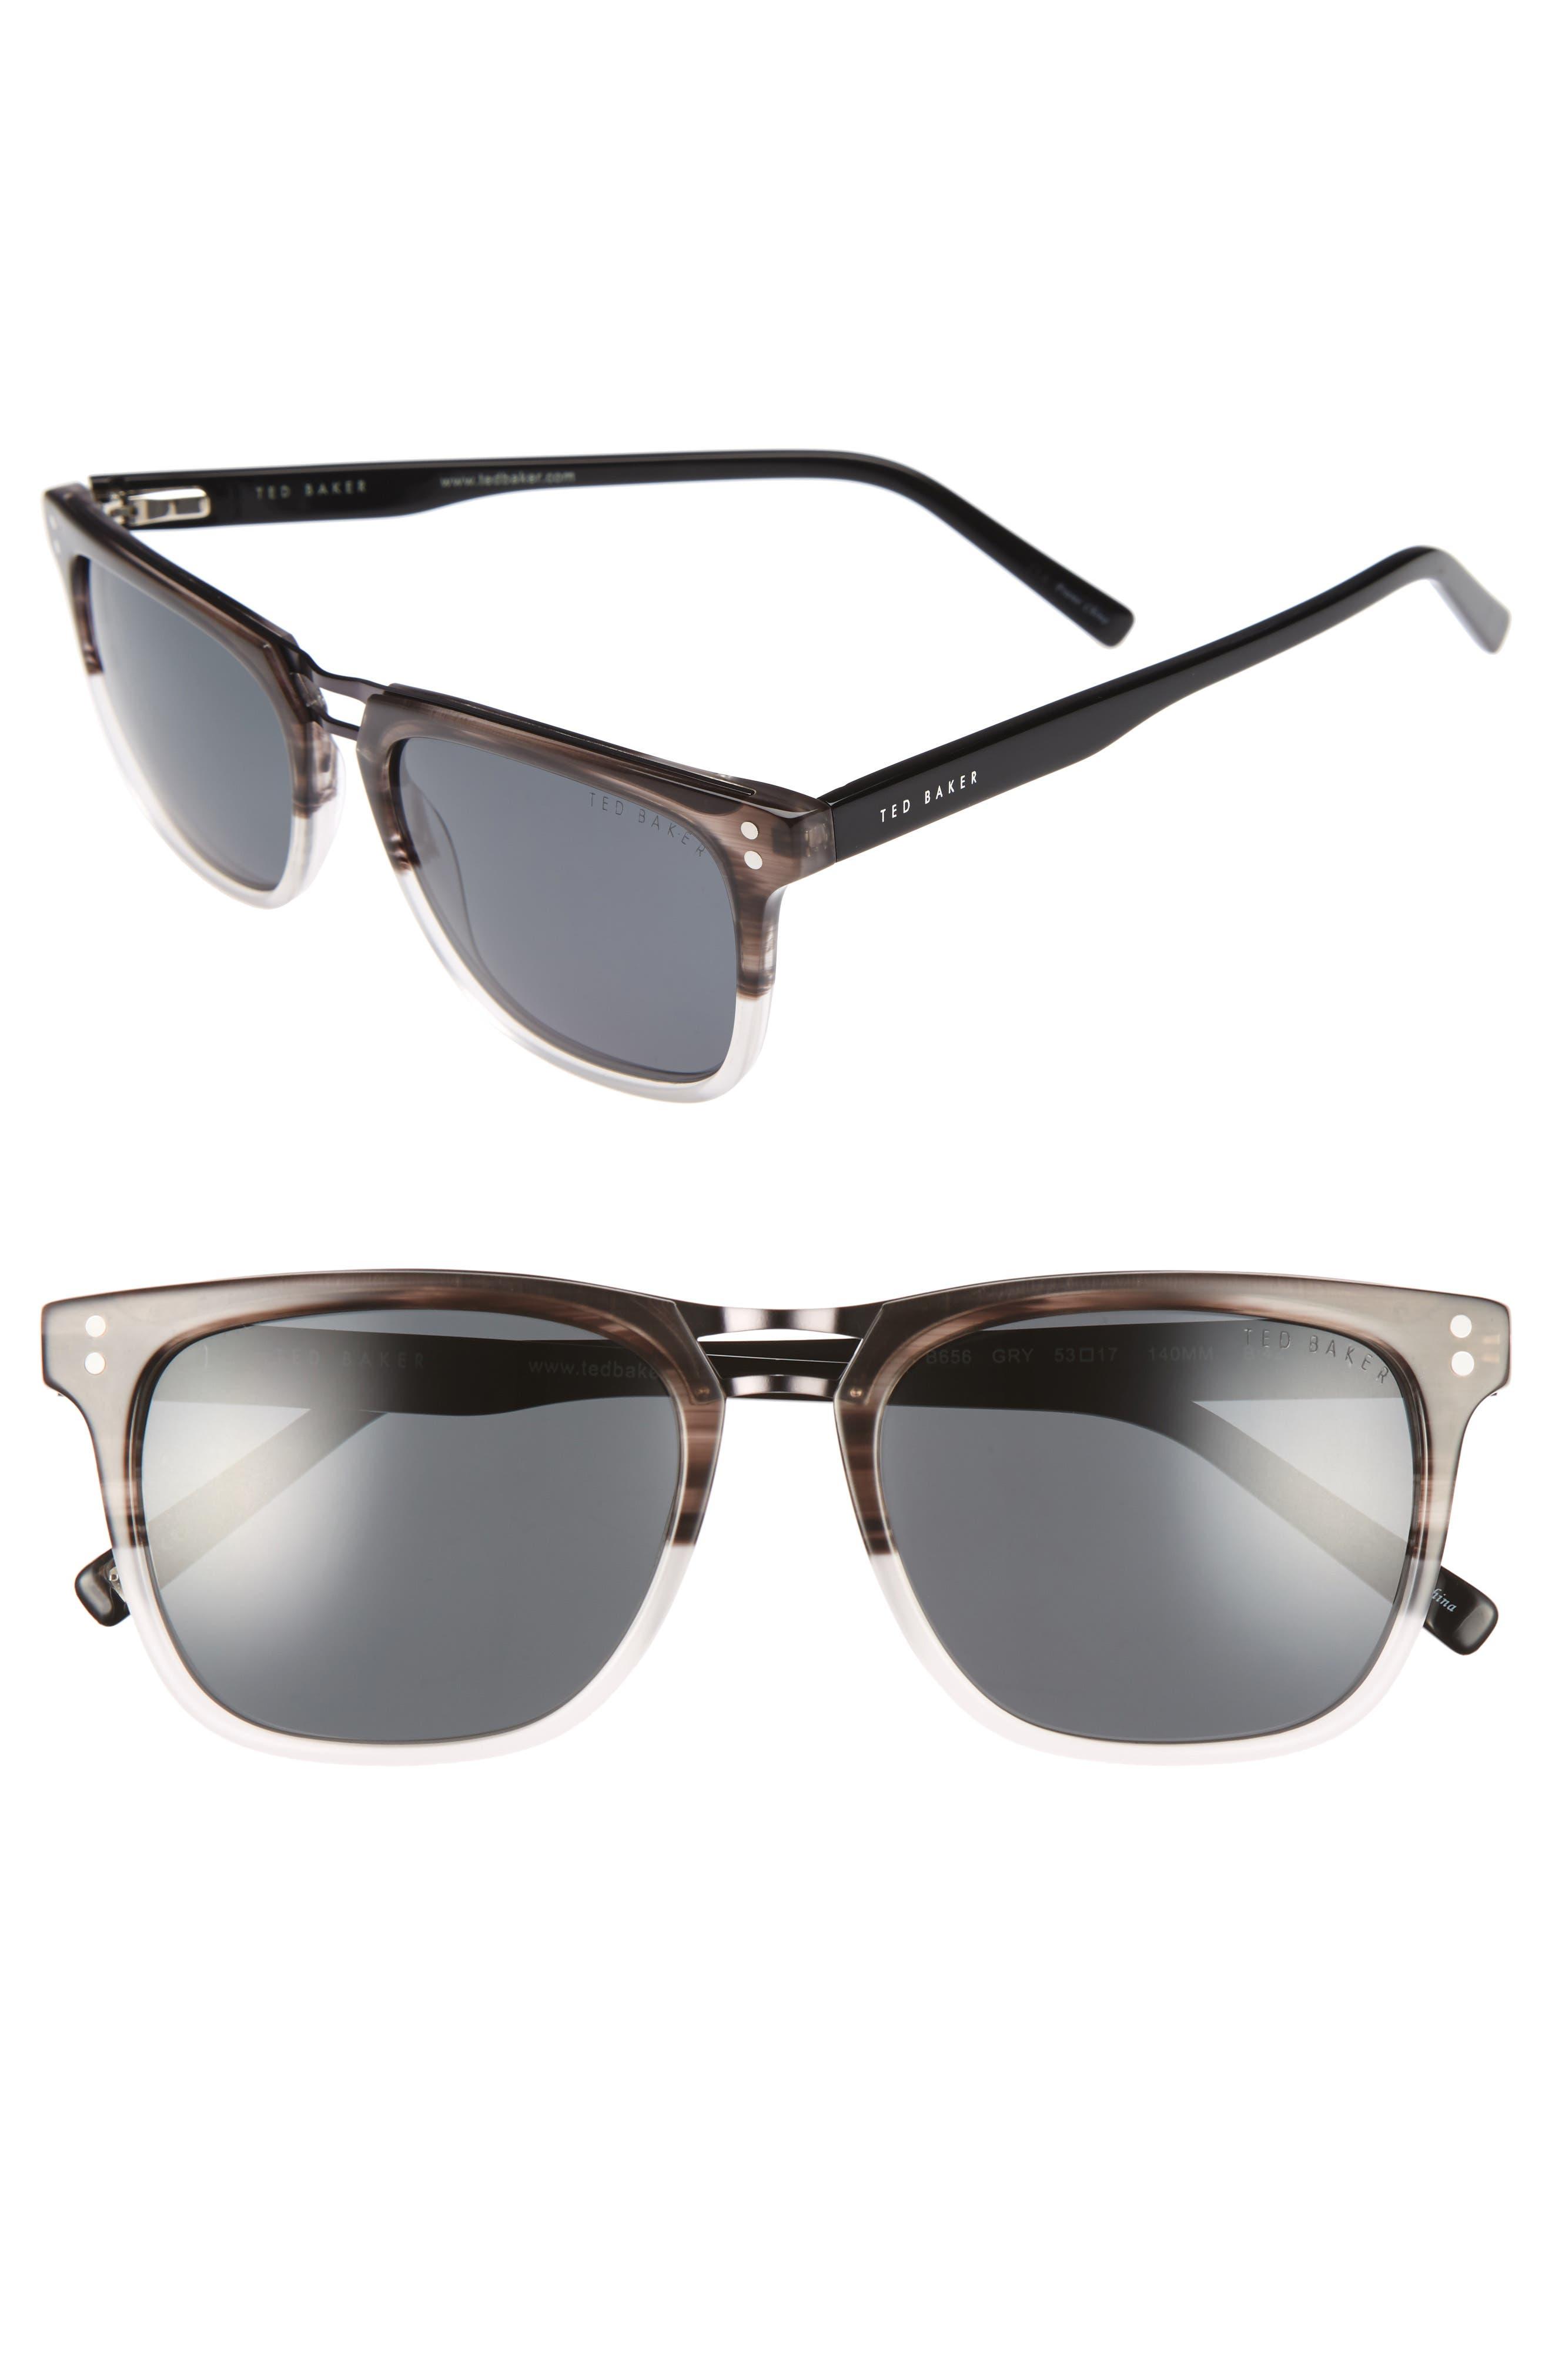 53mm Polarized Sunglasses,                         Main,                         color, 021